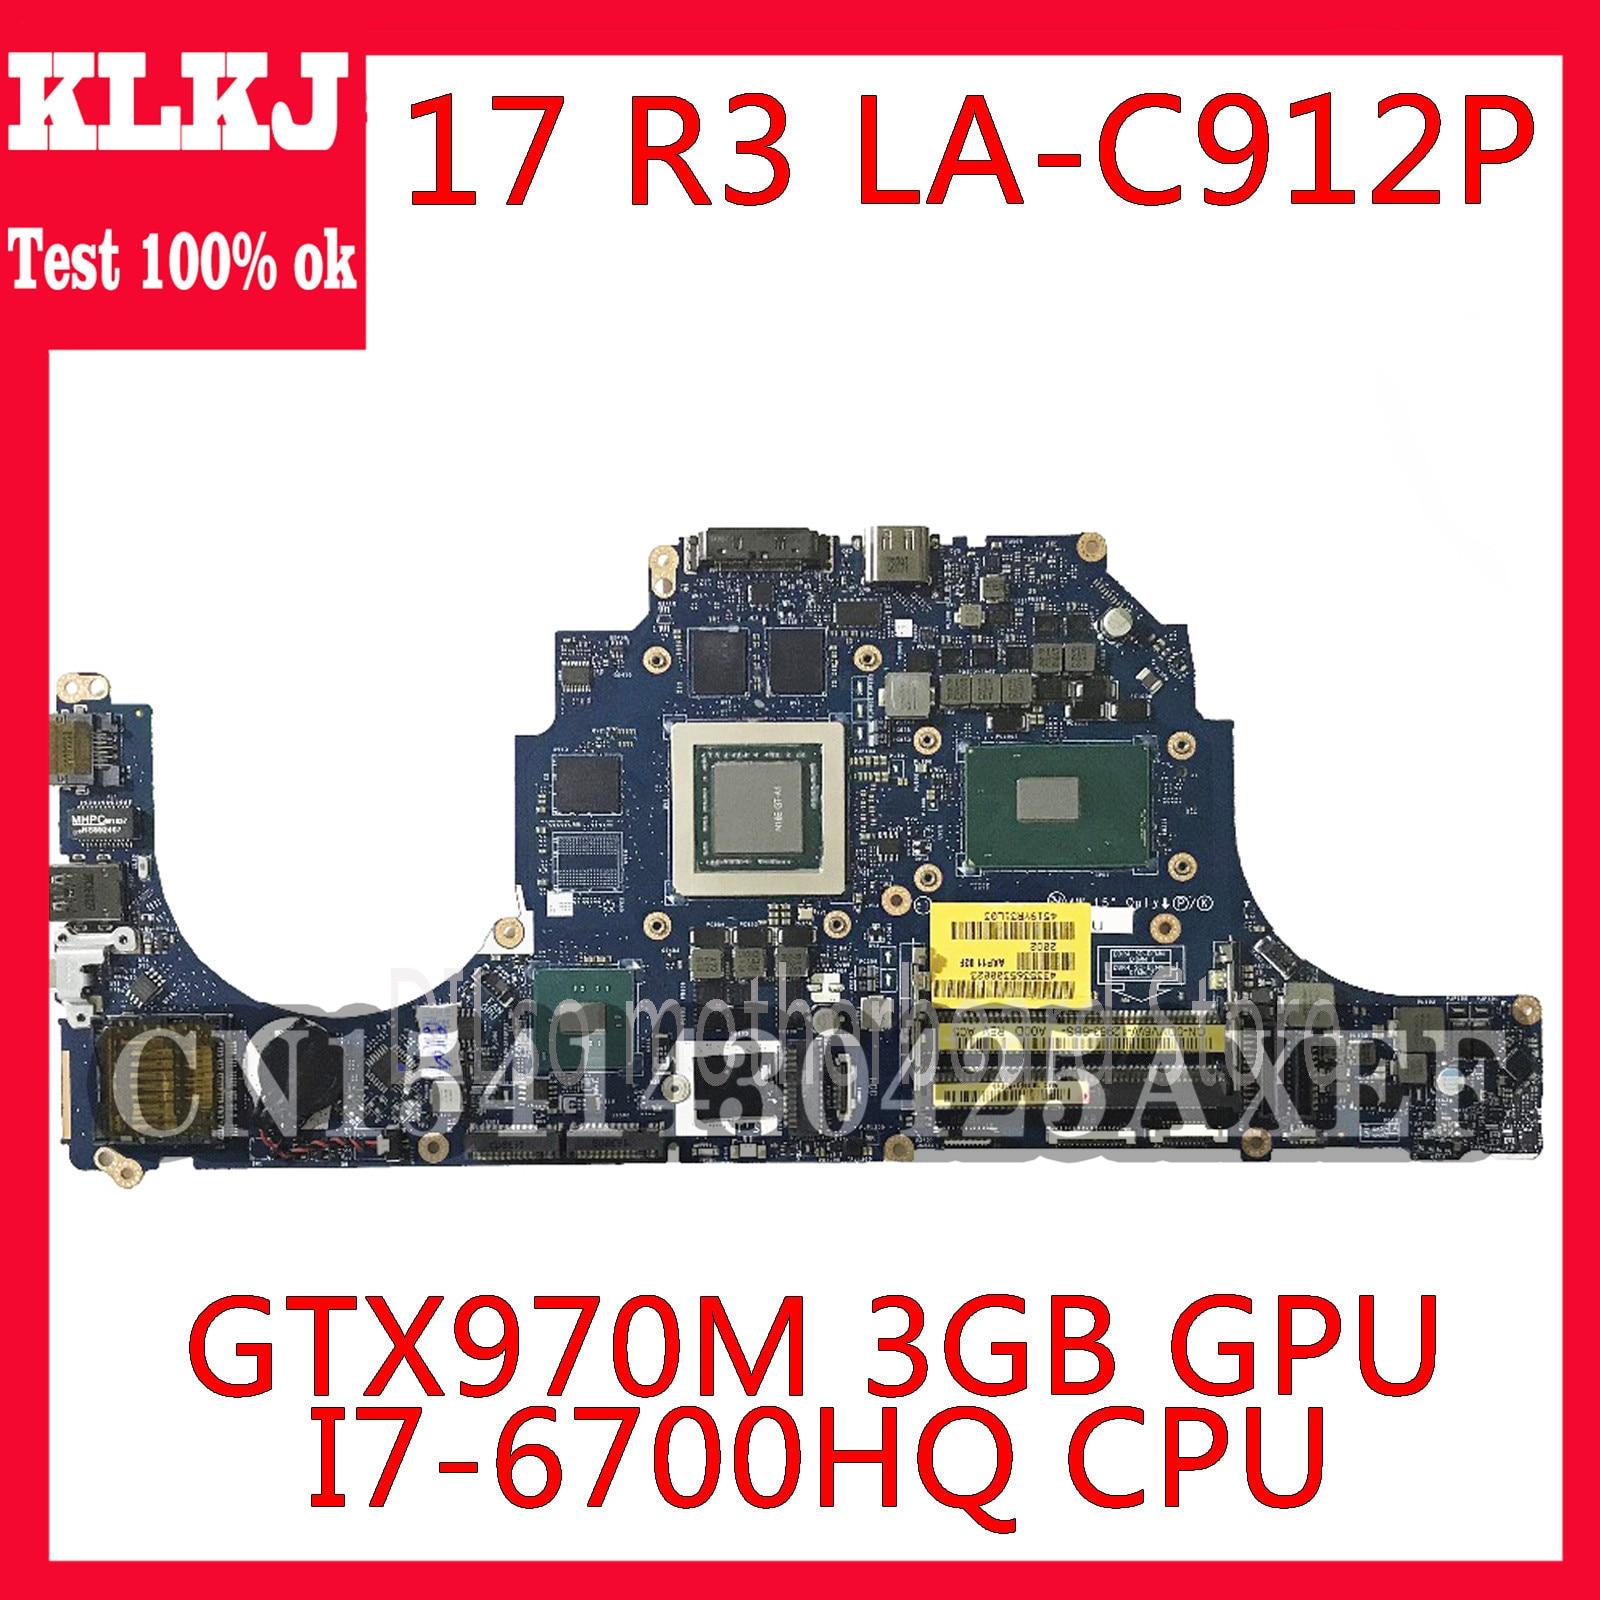 KLKJ LA-C912P اللوحة لديل من Alienware 17 R3 Mianboard i7-6700HQ CPU GTX970M-3GB CN-0DVV6W 0DVV6W الأصلي اختبار العمل